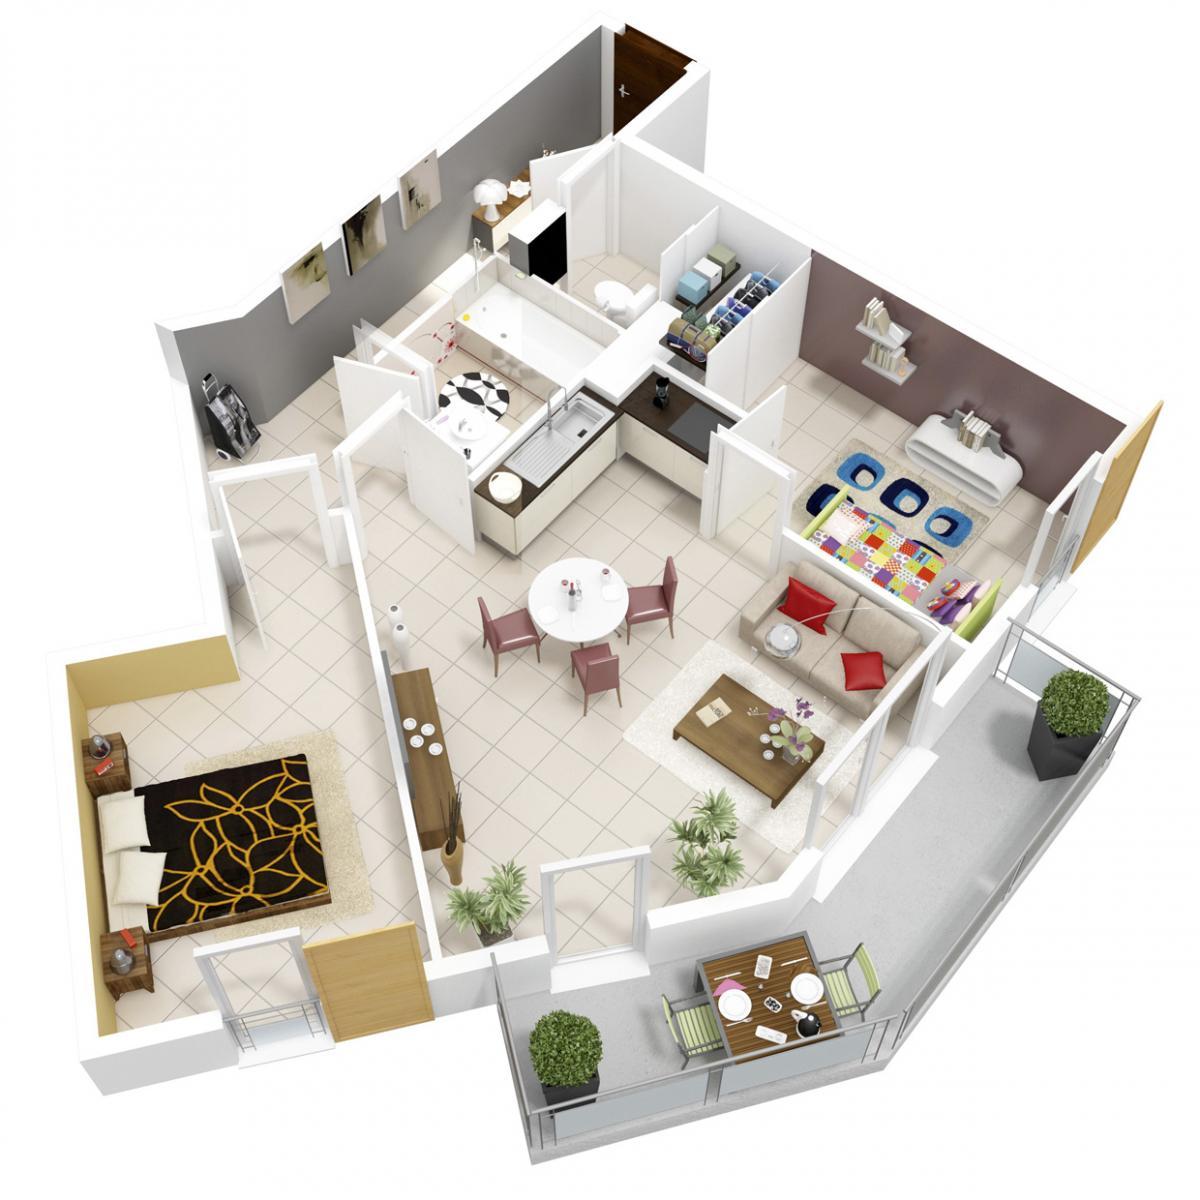 Interieur maison lego - Debarrasser une maison ...